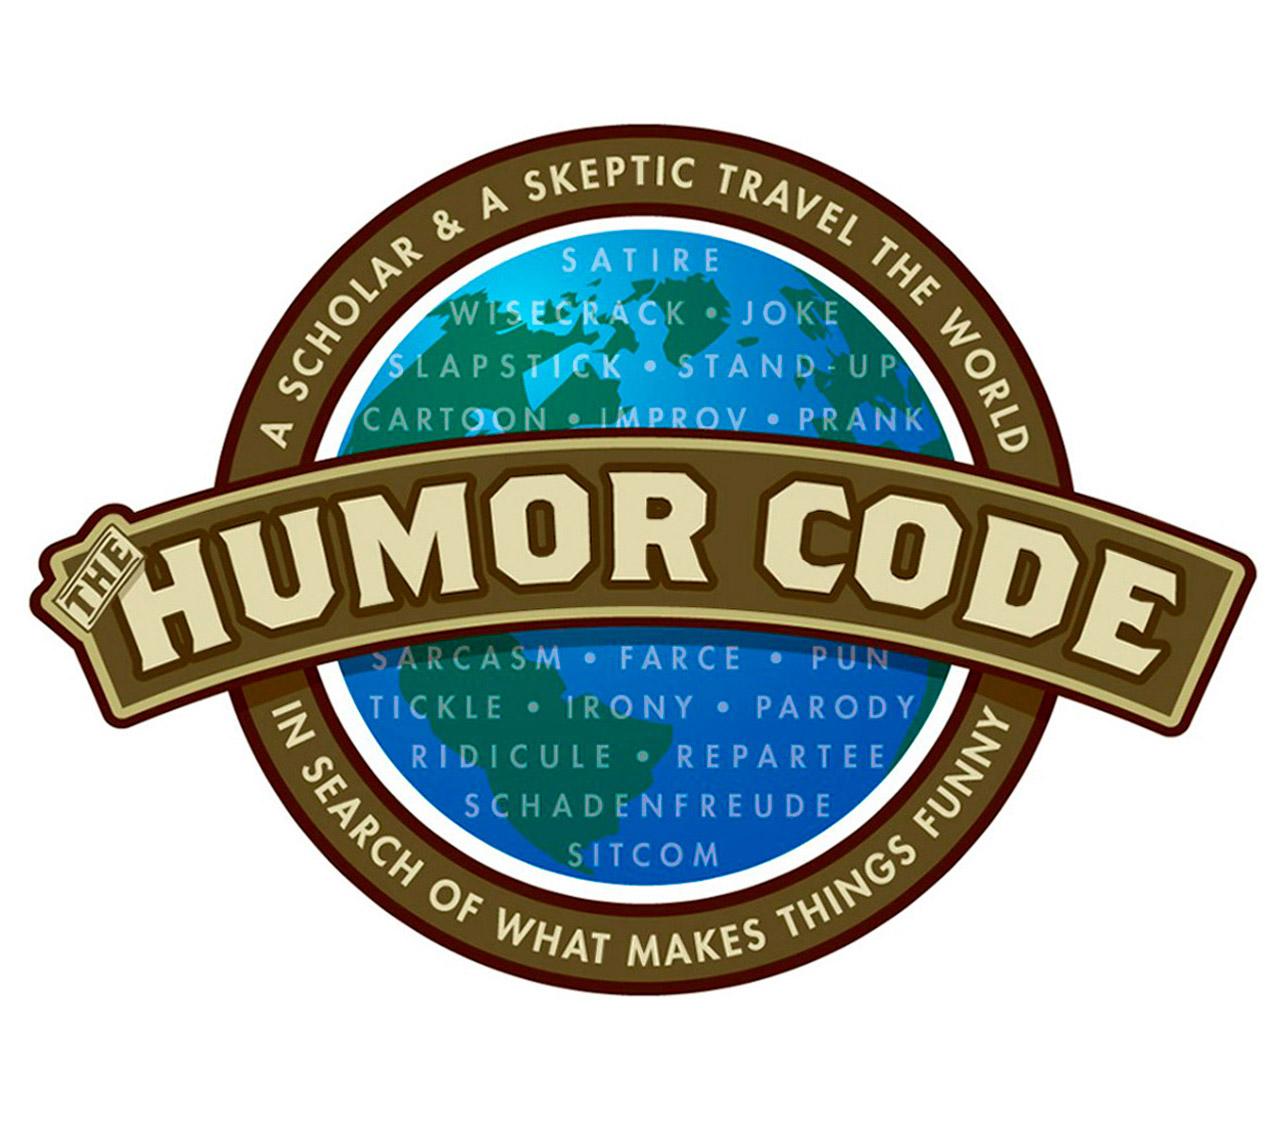 The Humor Code Branding